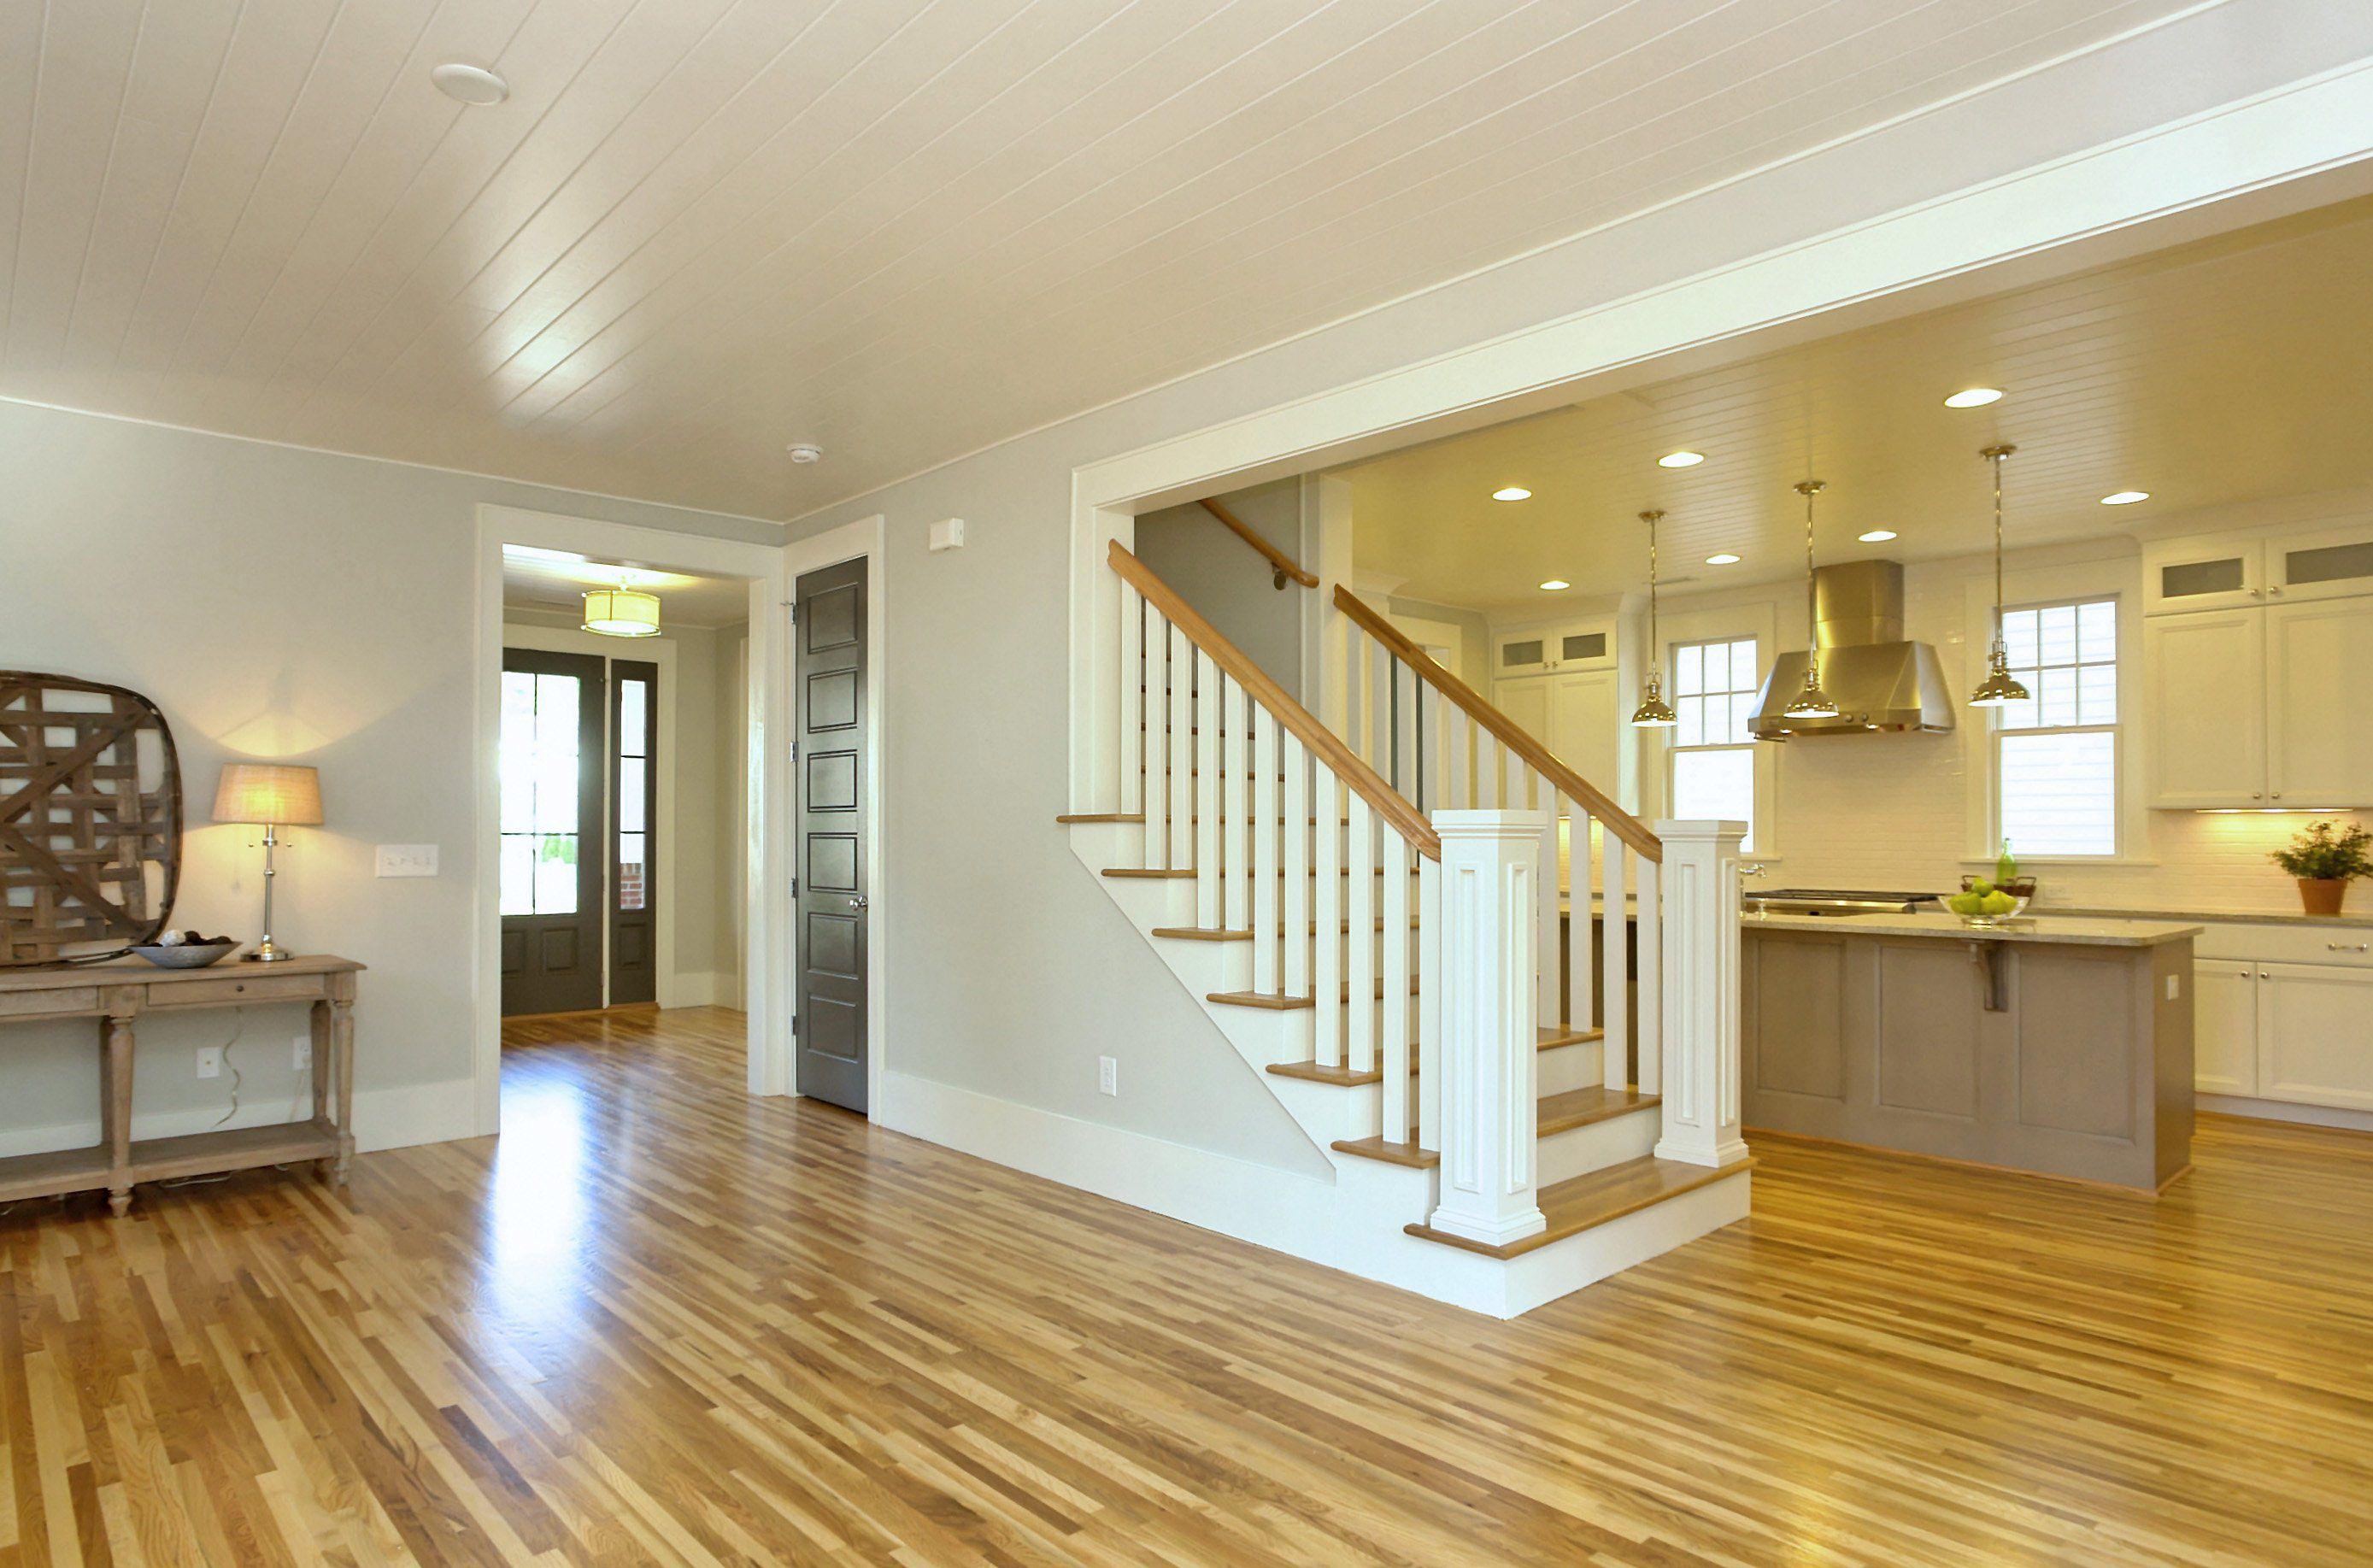 index raymondcraft ceilings wood ceiling portfolios paneling